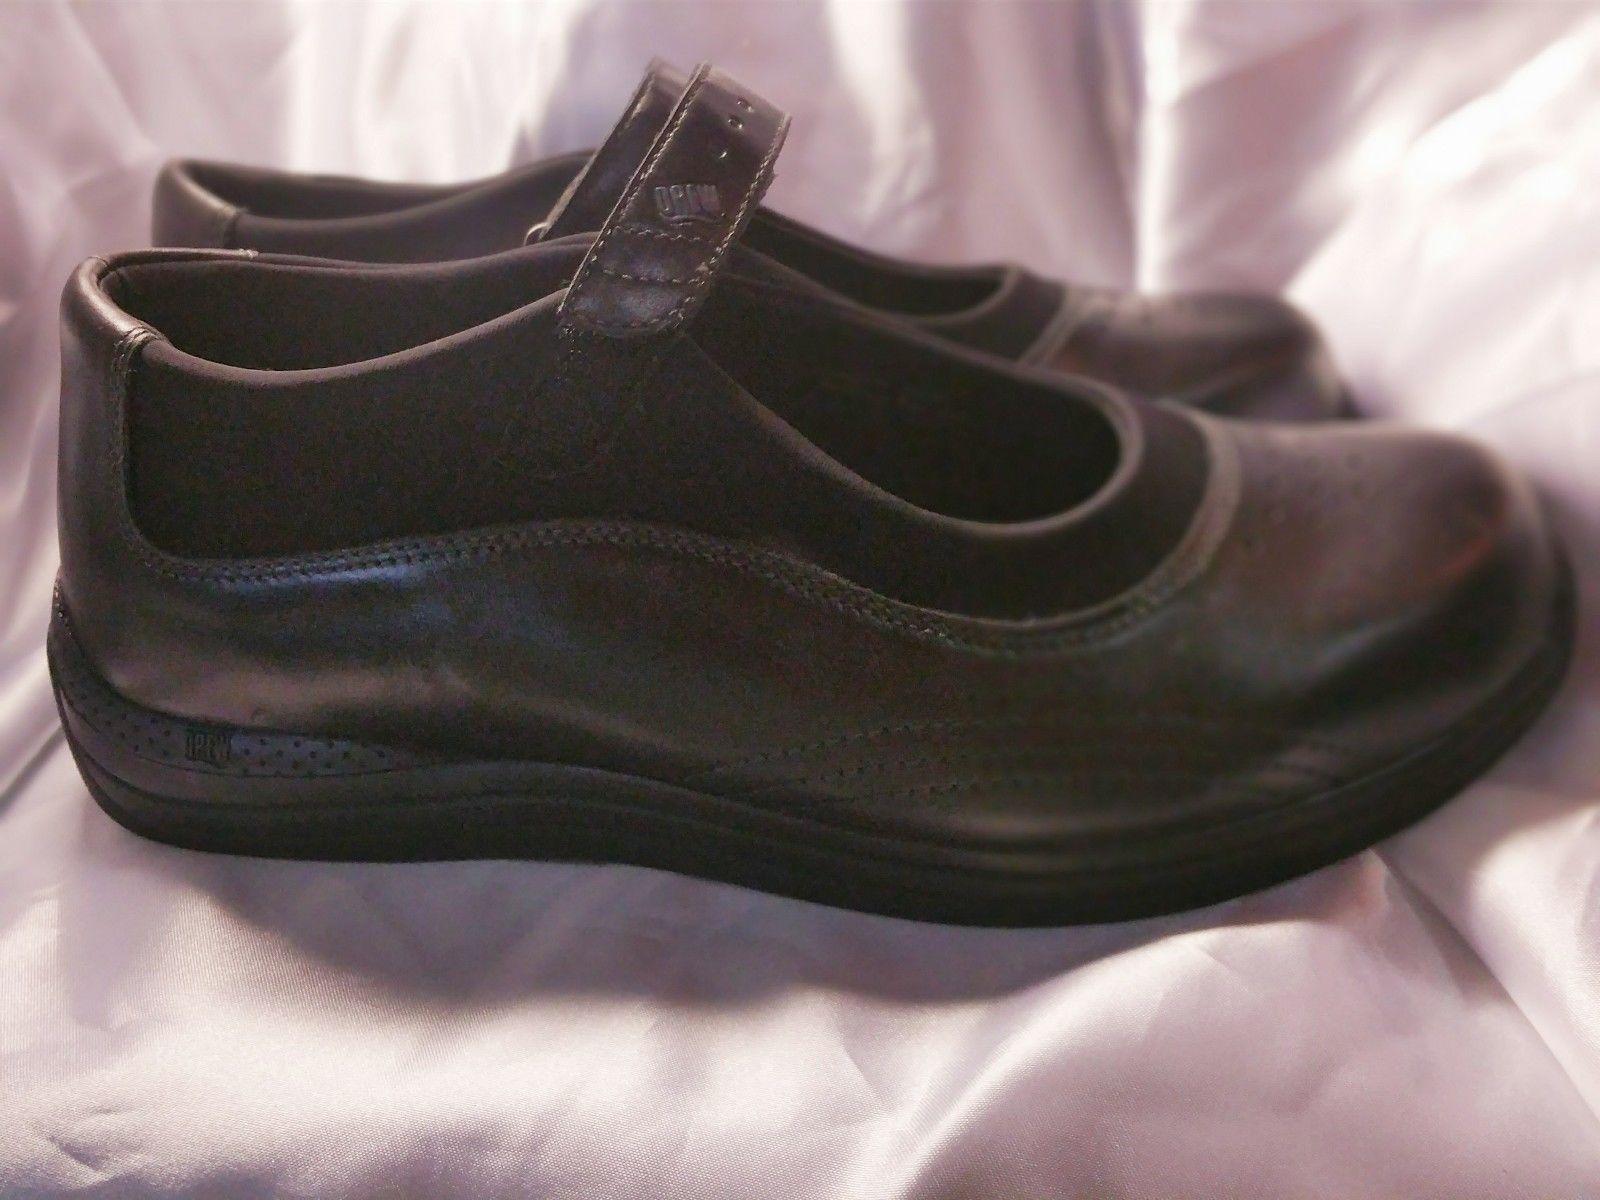 Pre-owned DREW Women's Mary Jane Black Leather Diabetic Shoe Size 11WW